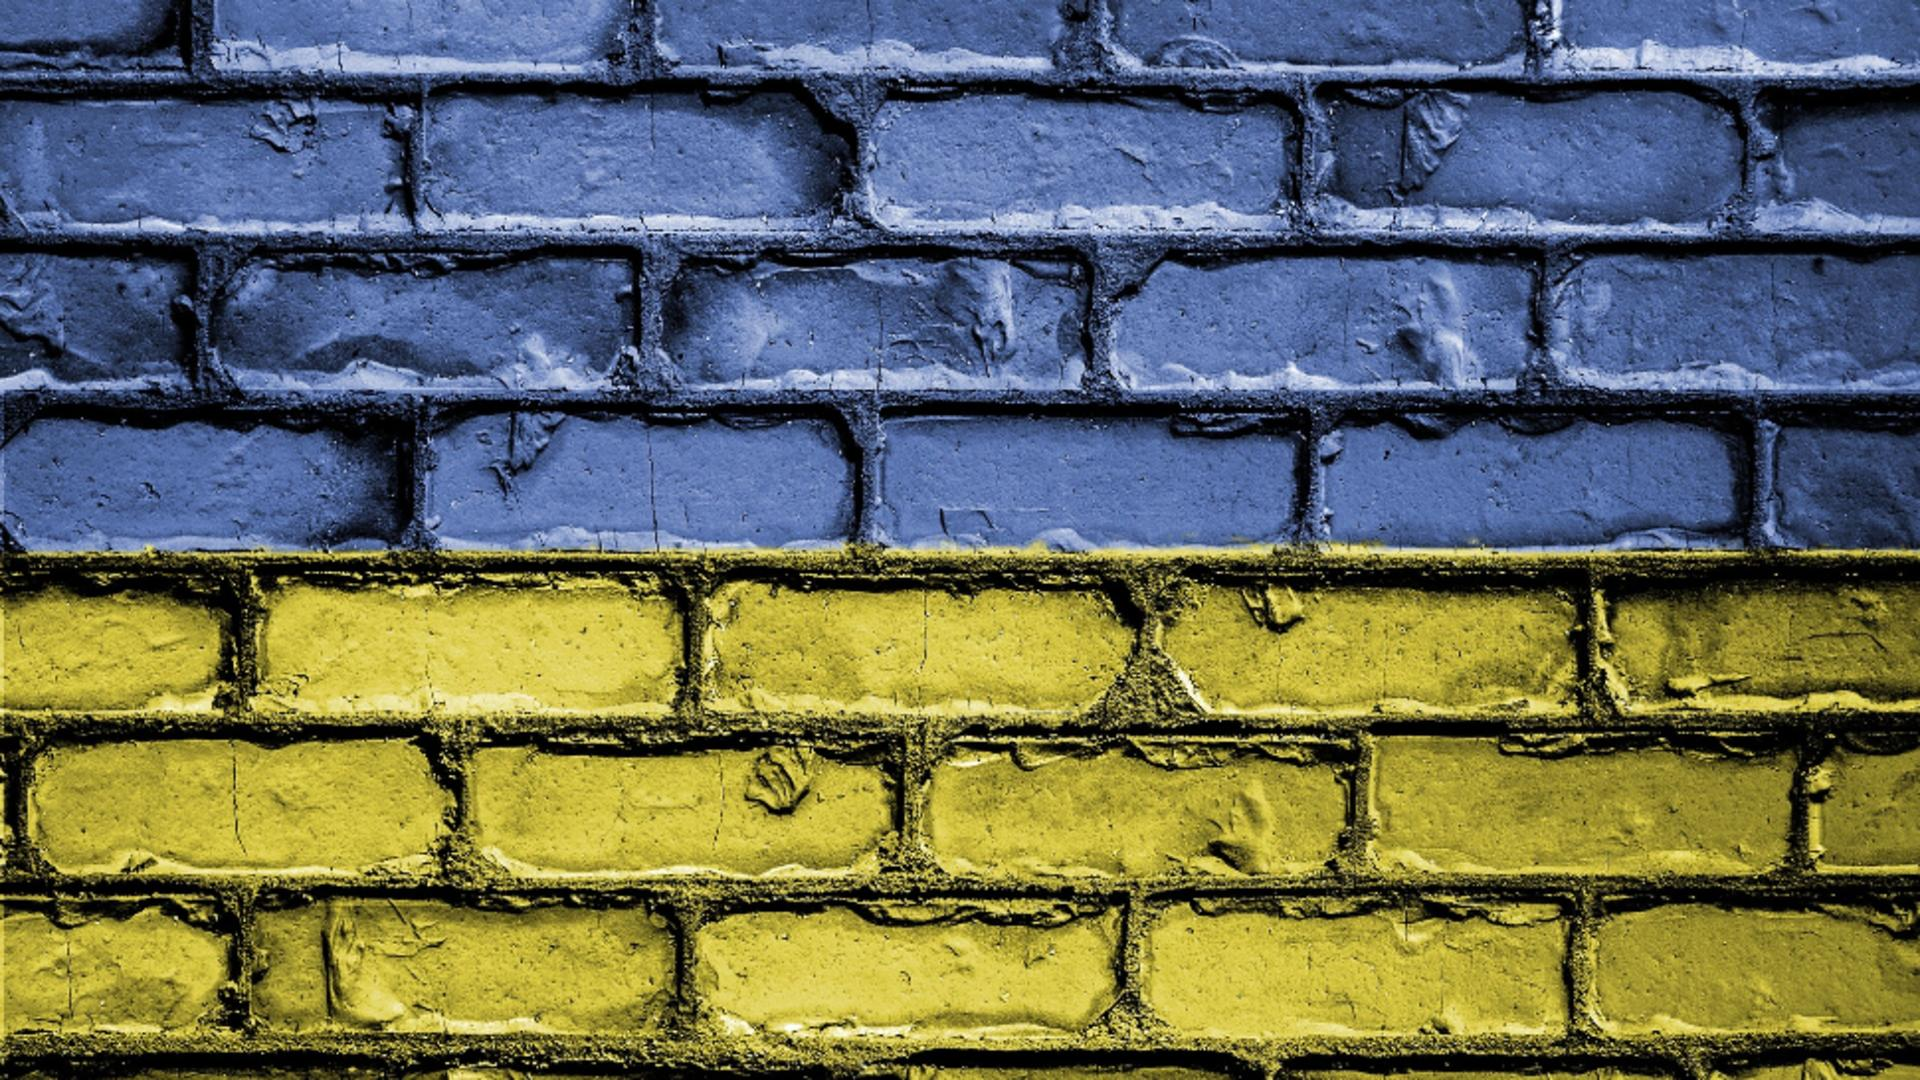 Ucraina - conflicte militare/sursa foto: pixabay